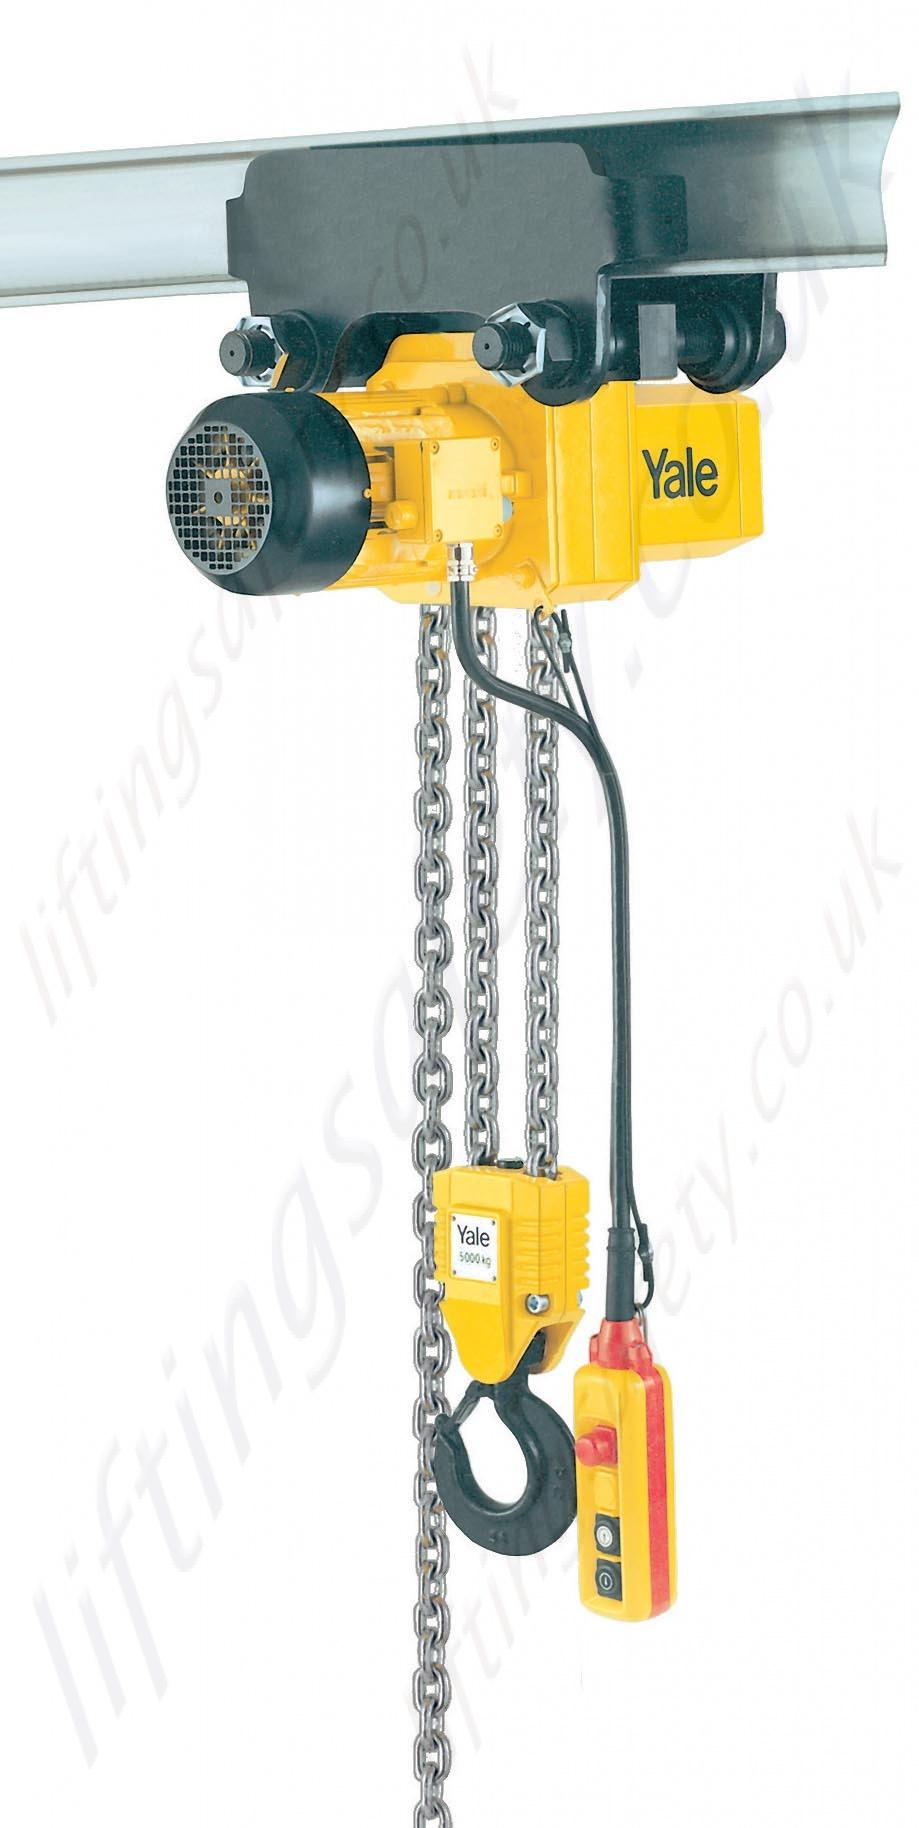 Chain Lift Diagram : Yale cpe electric chain hoist v ph hz range from